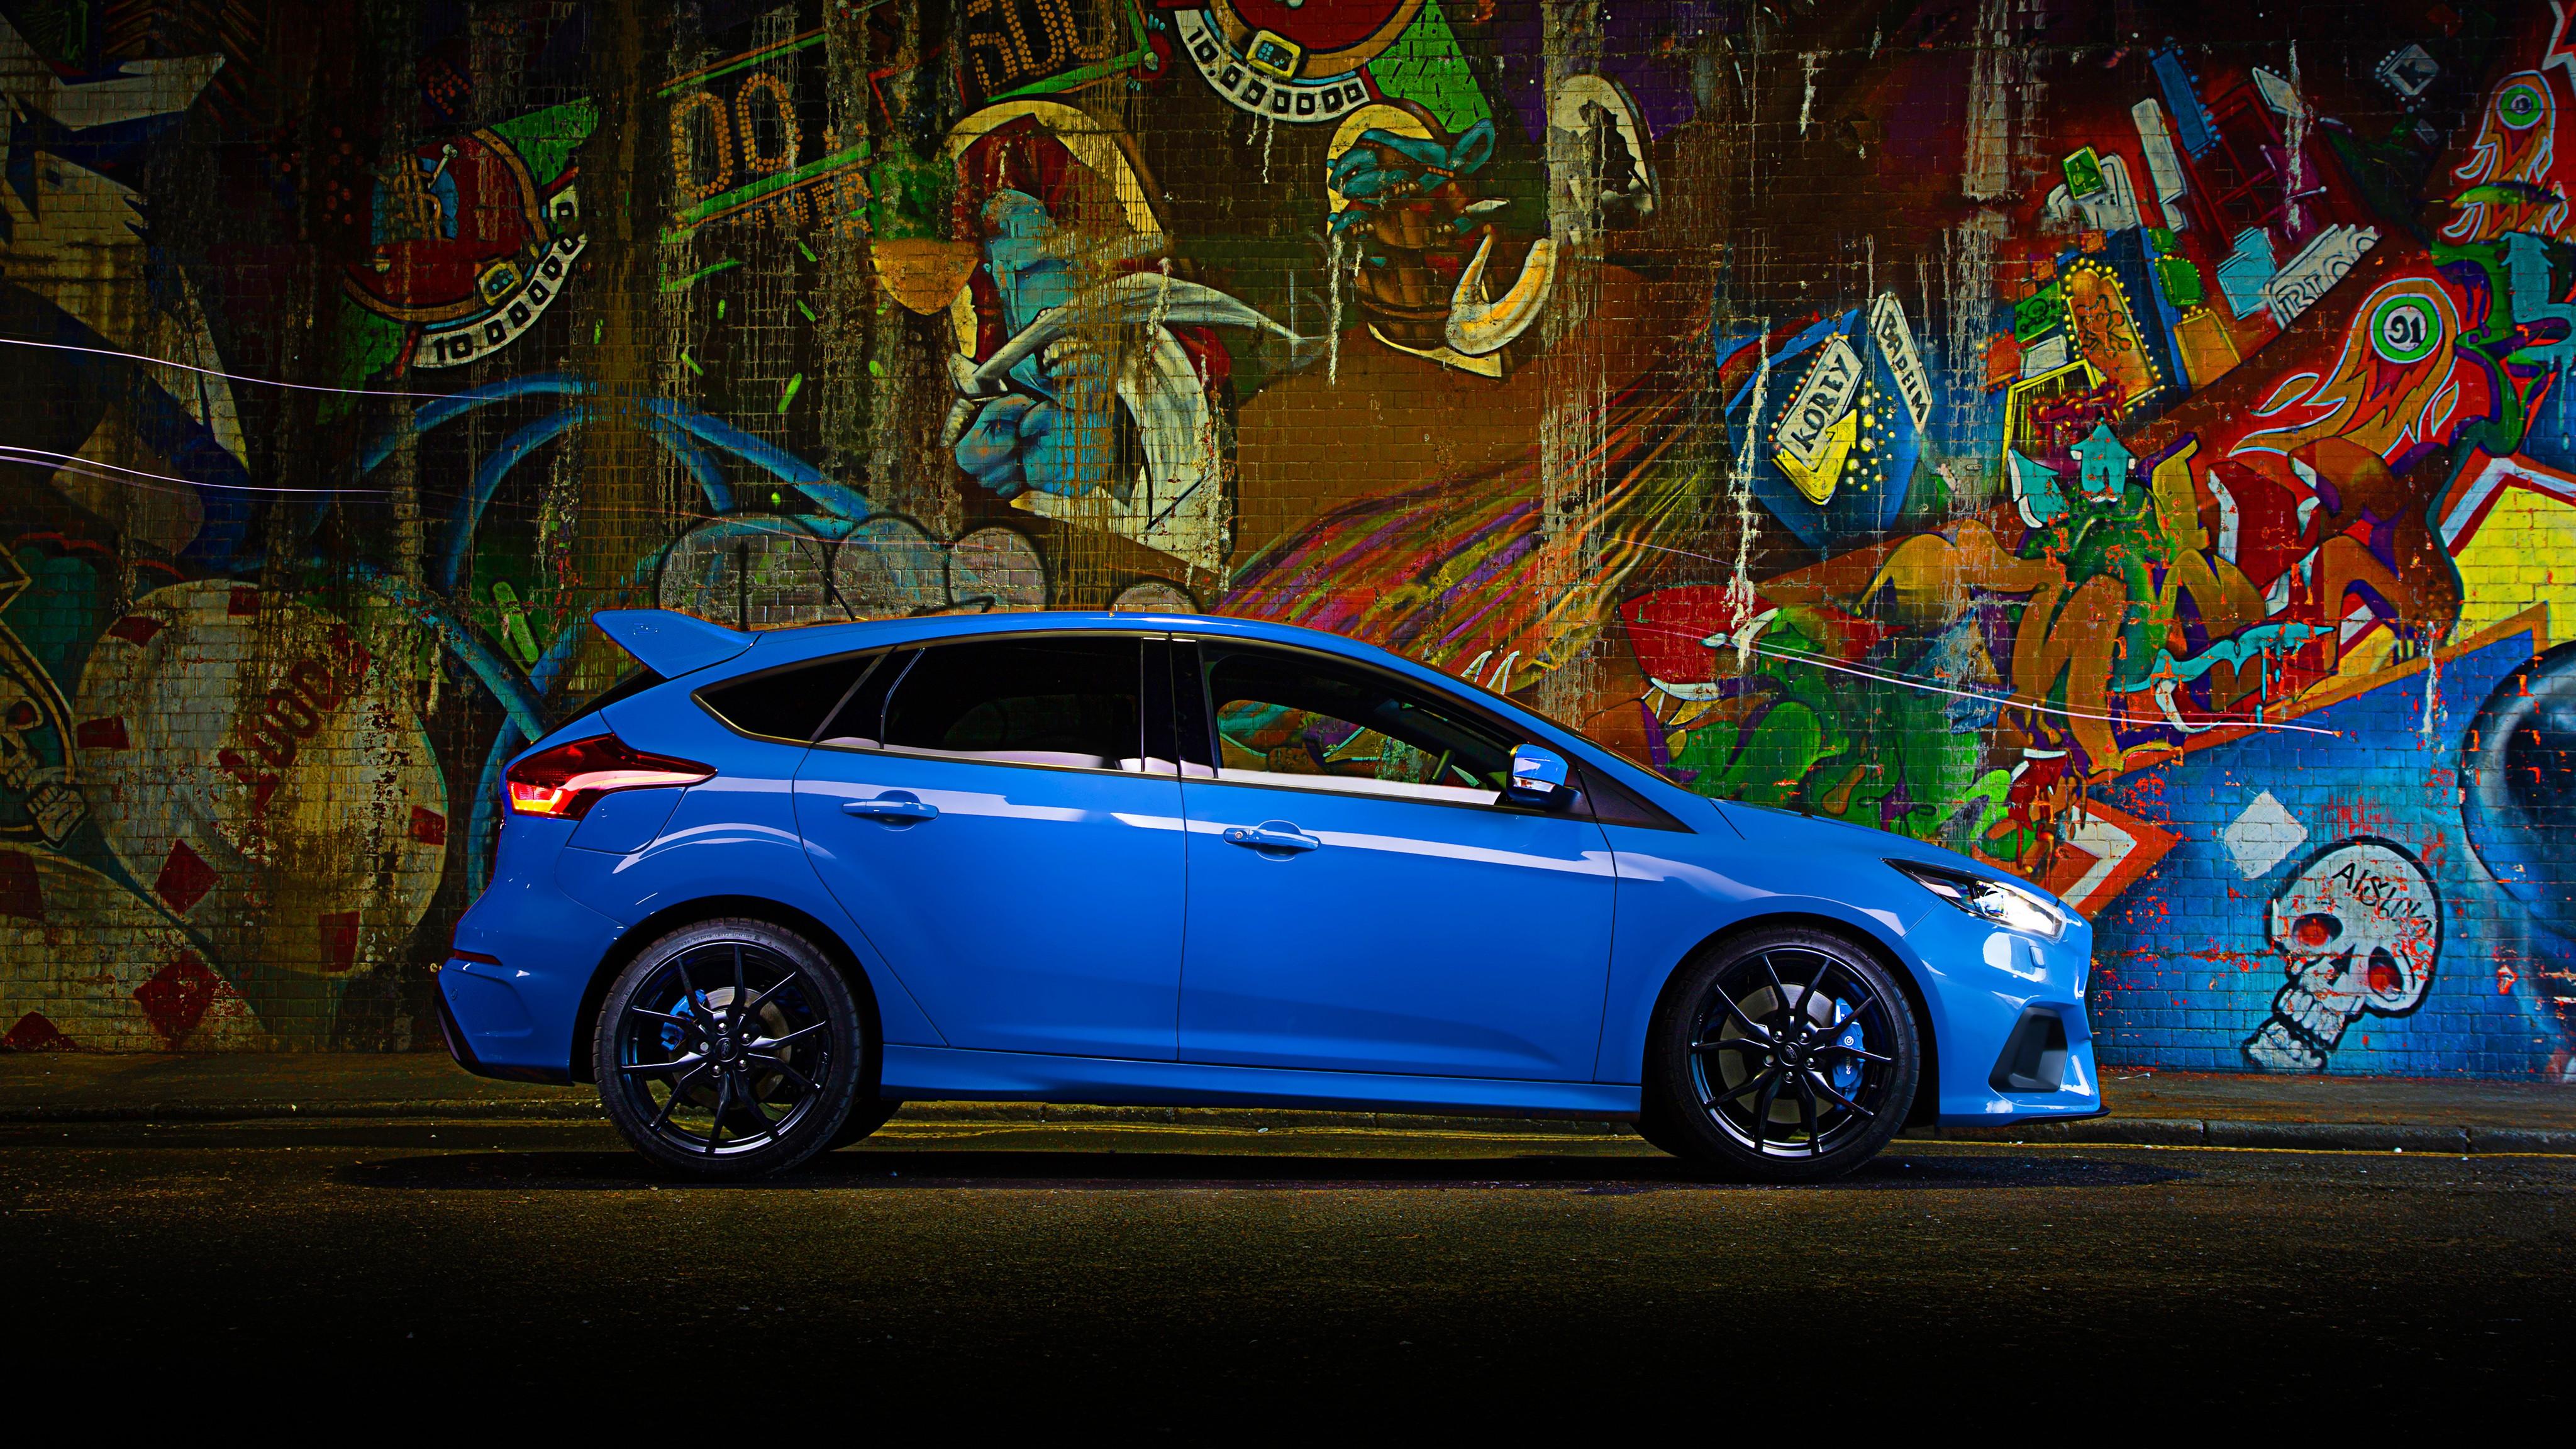 High Performance Car Pc Desktop Wallpaper Wallpaper Ford Focus Rs Hatchback Blue Cars Amp Bikes 10417